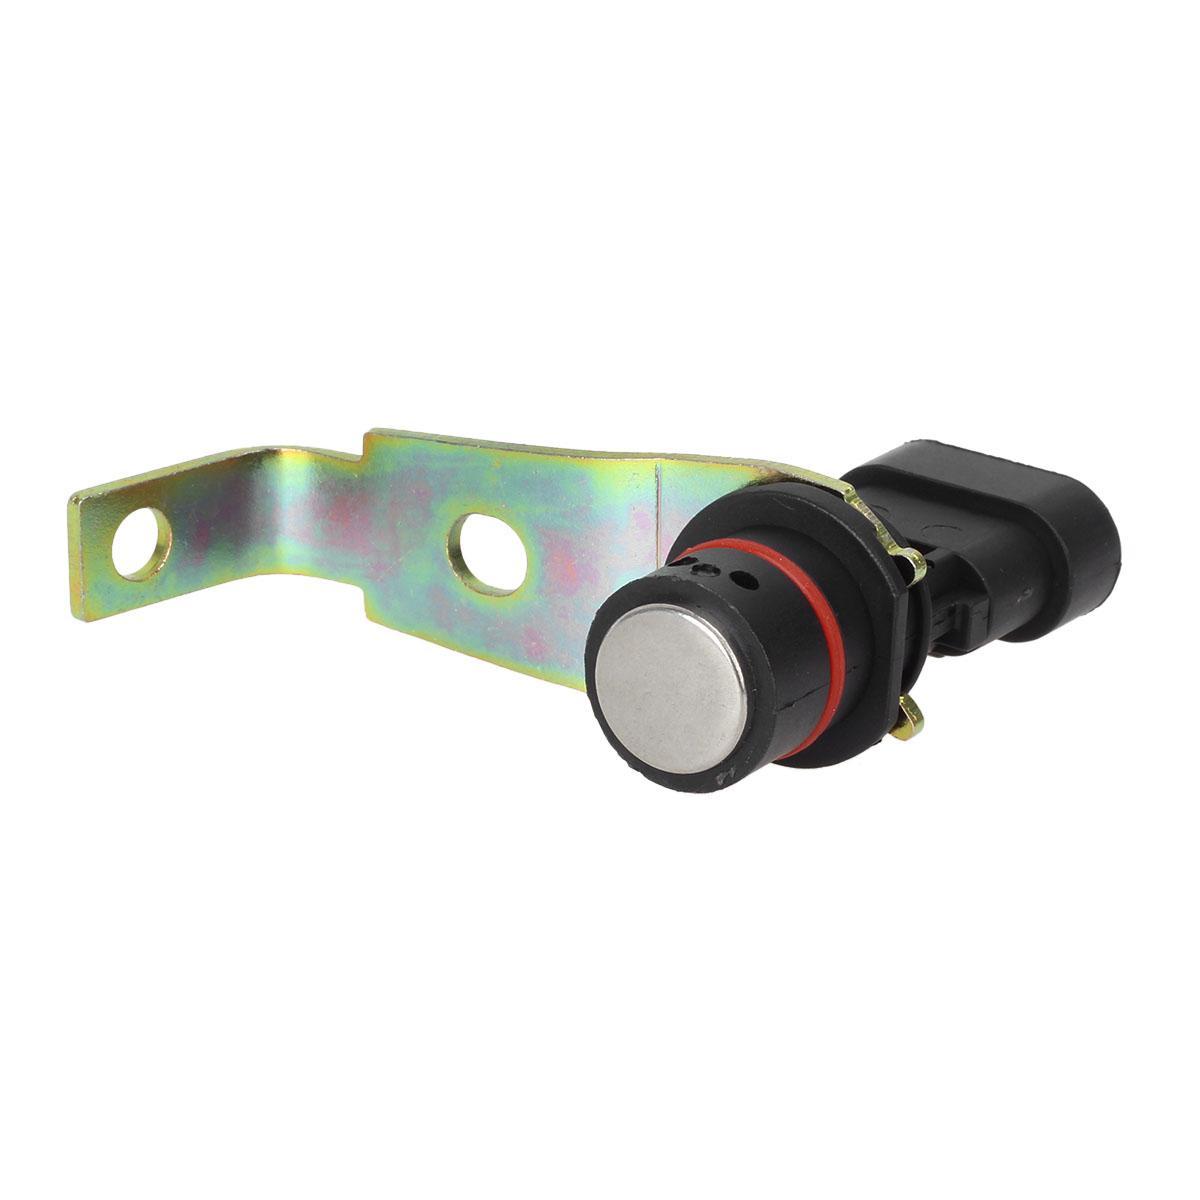 Crankshaft Position Sensor For Chevy Astro GMC 5.7L V8 V6 C1500 C2500 C3500 X0N0